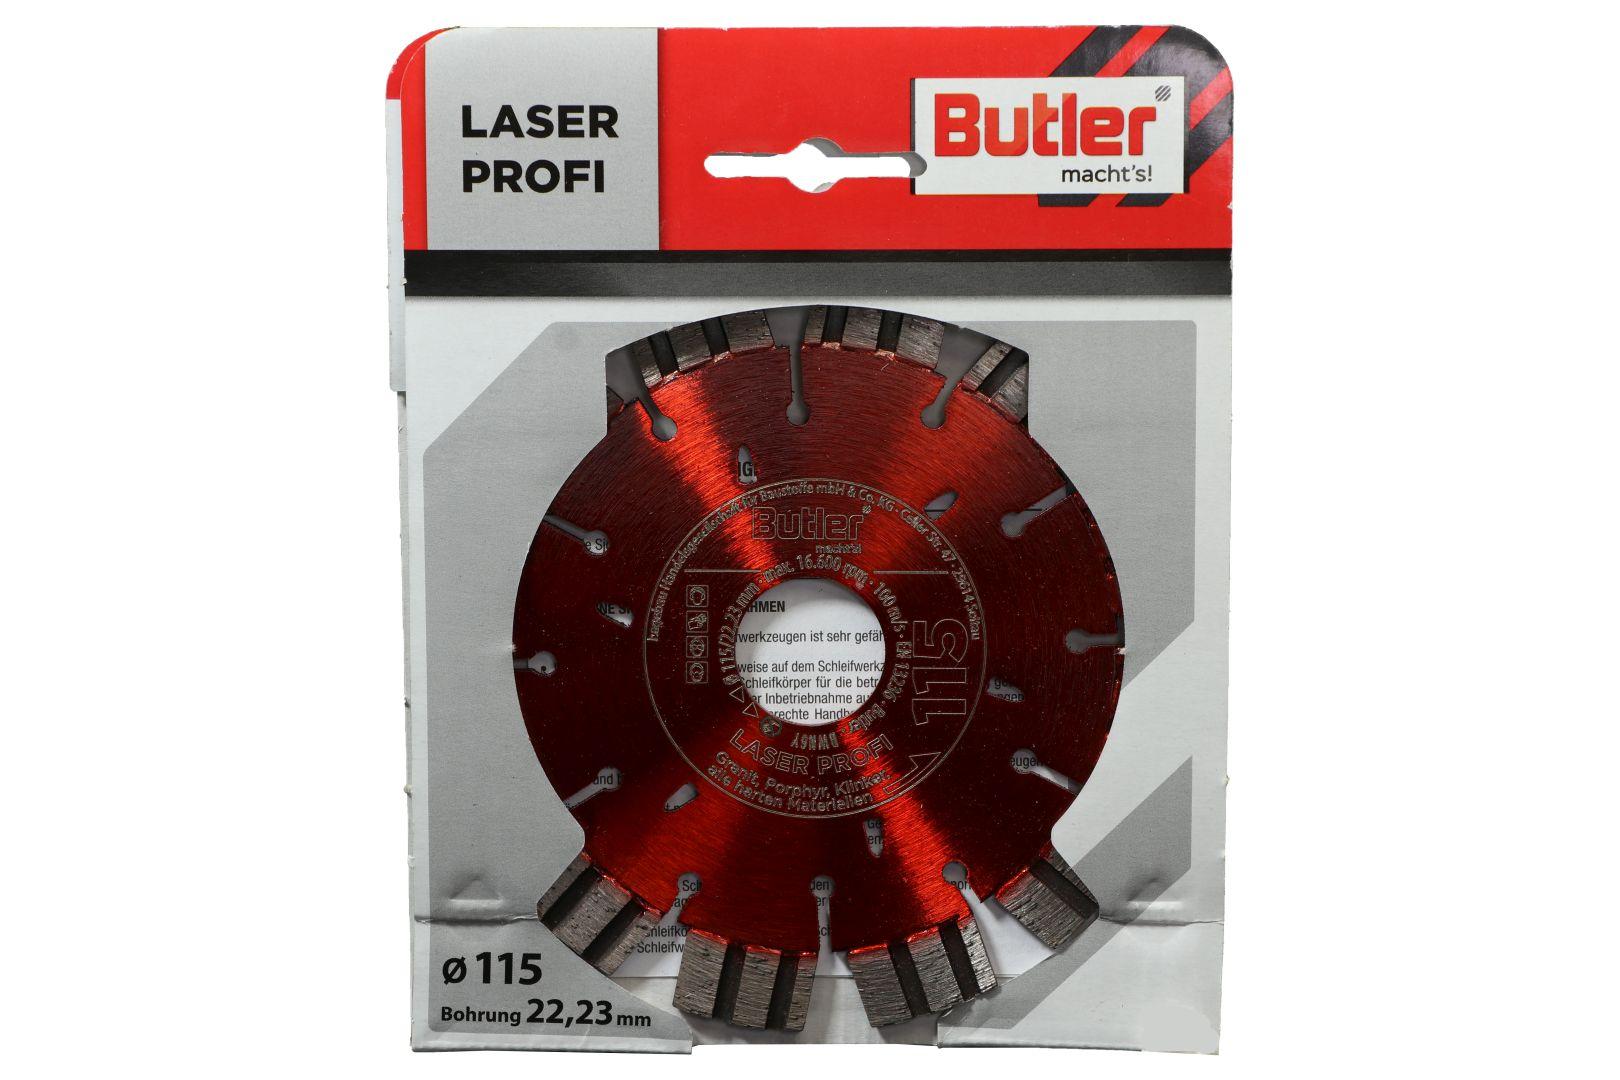 Butler macht's! Diamant-Trennscheibe Laser Profi, Bohrung: 22,23 mm, Ø 115 mm